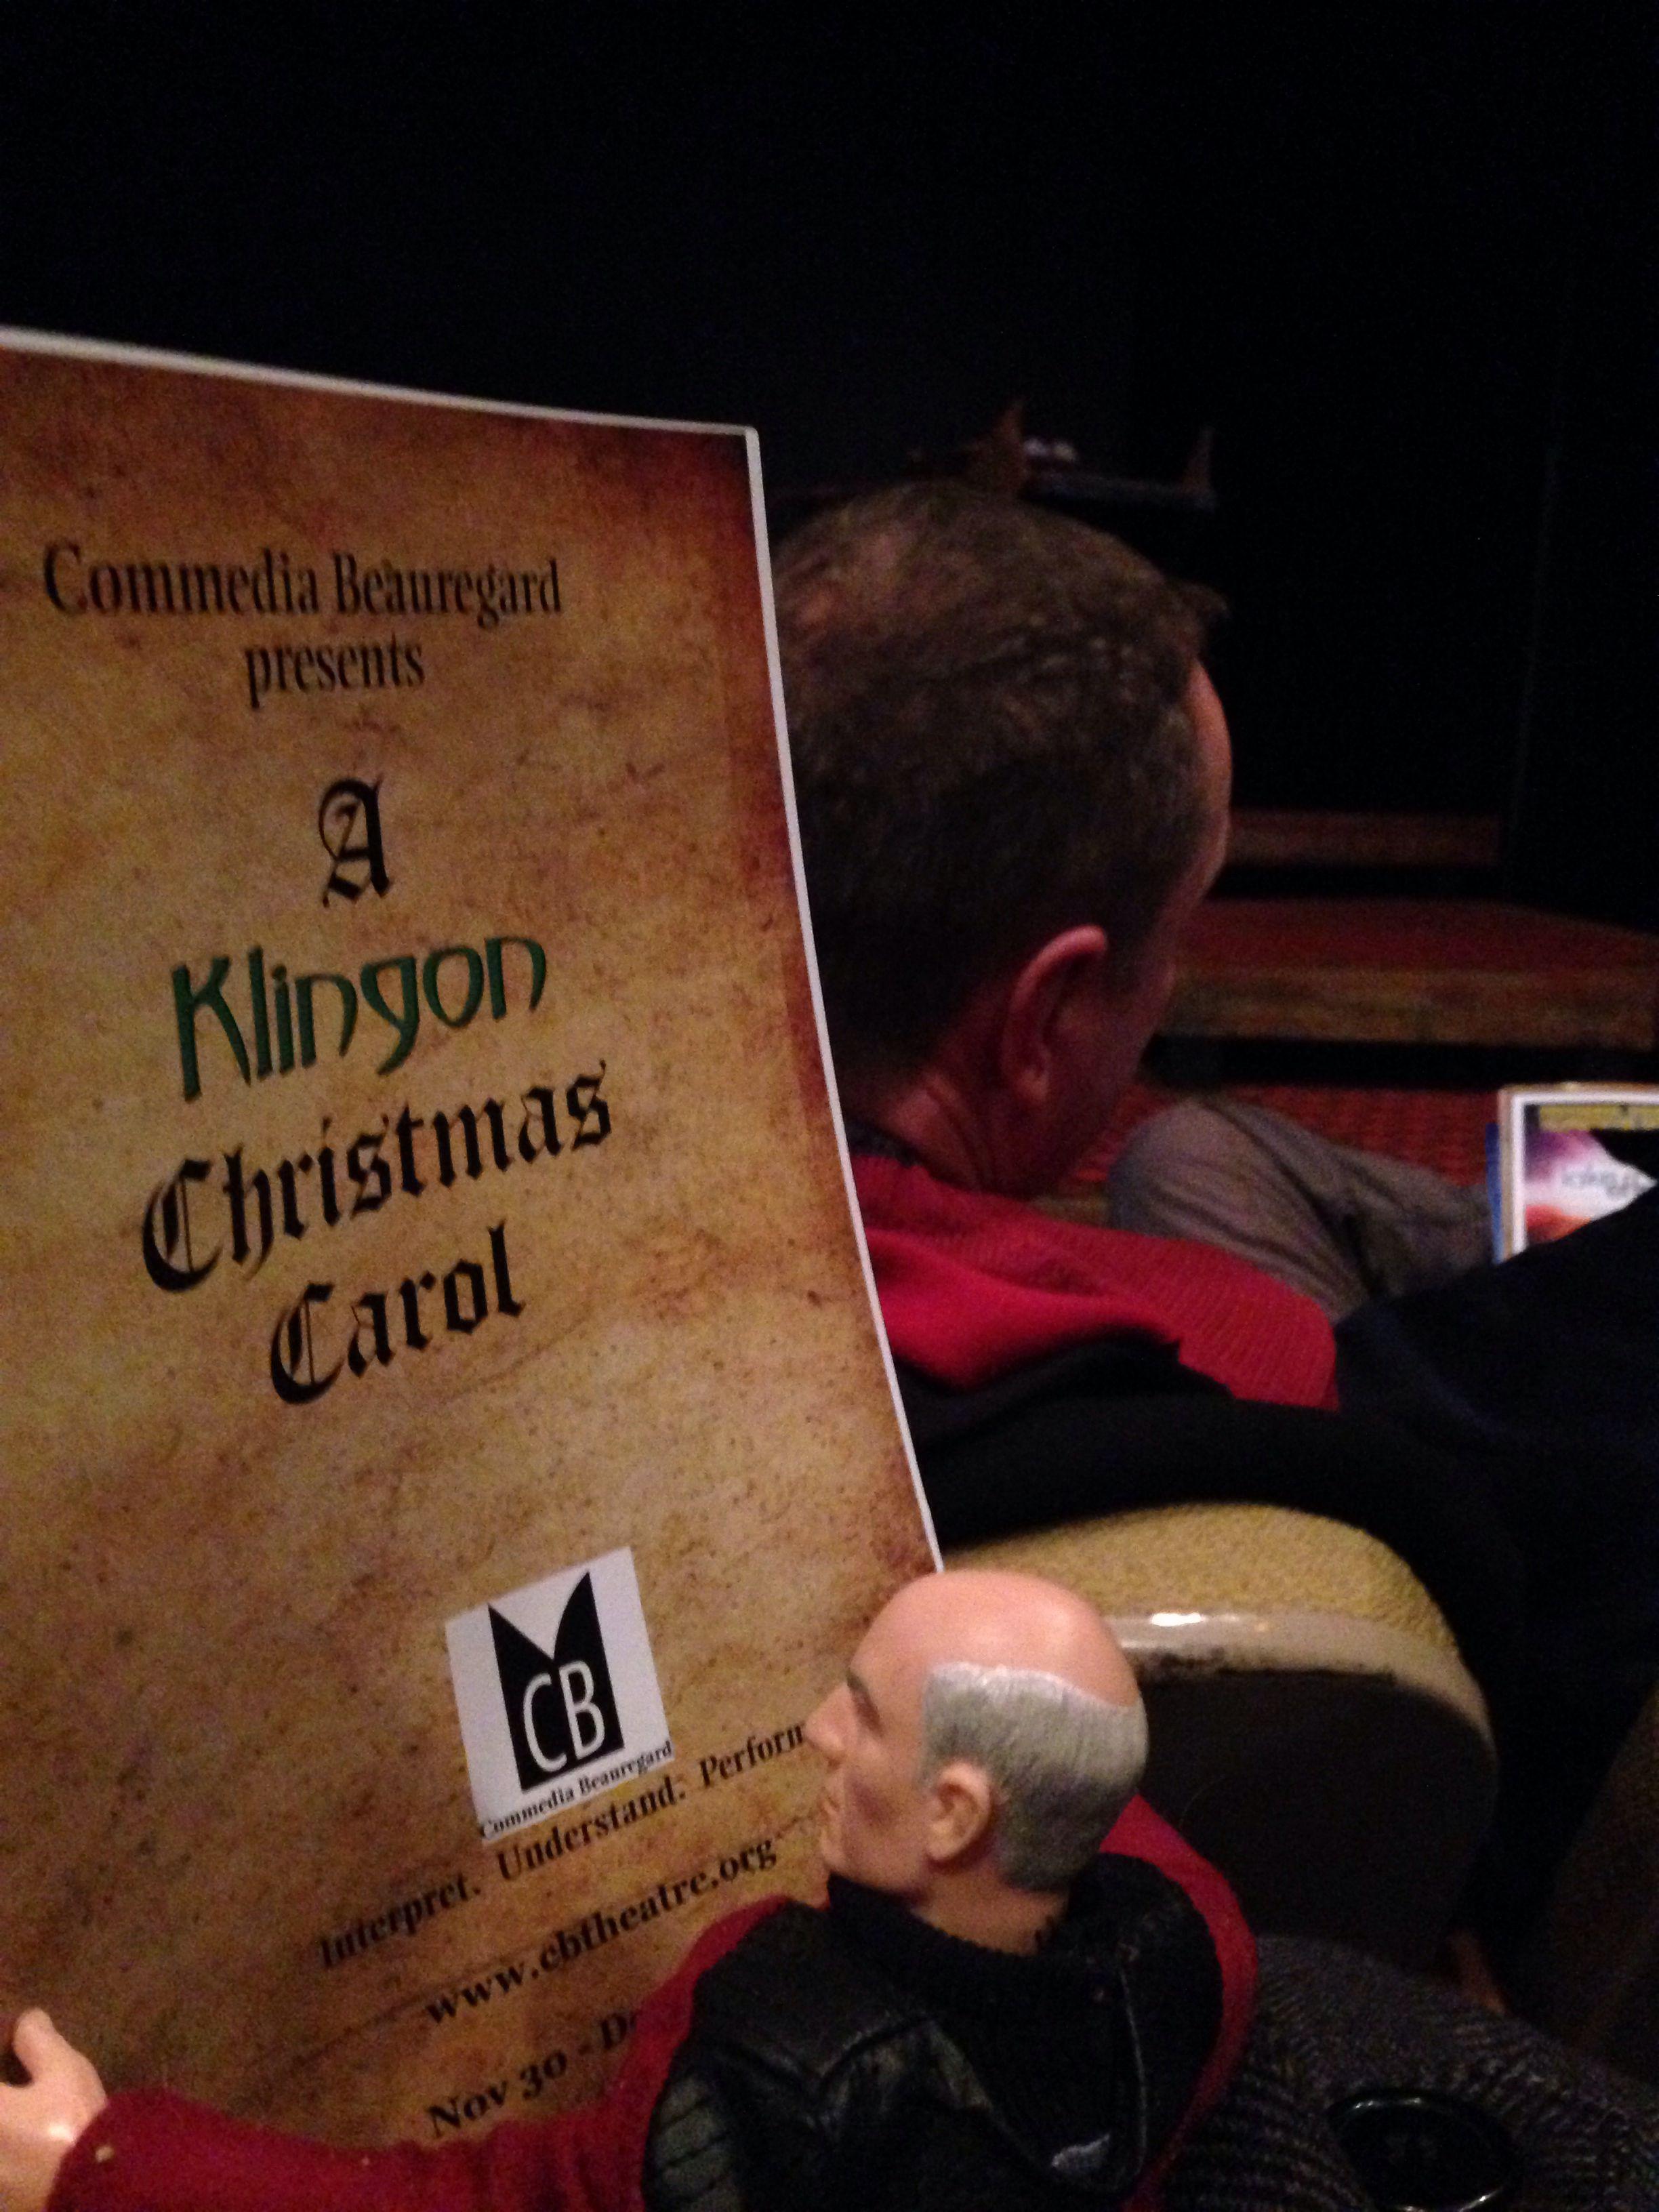 Enjoying another performance of A Klingon Christmas Carol ...